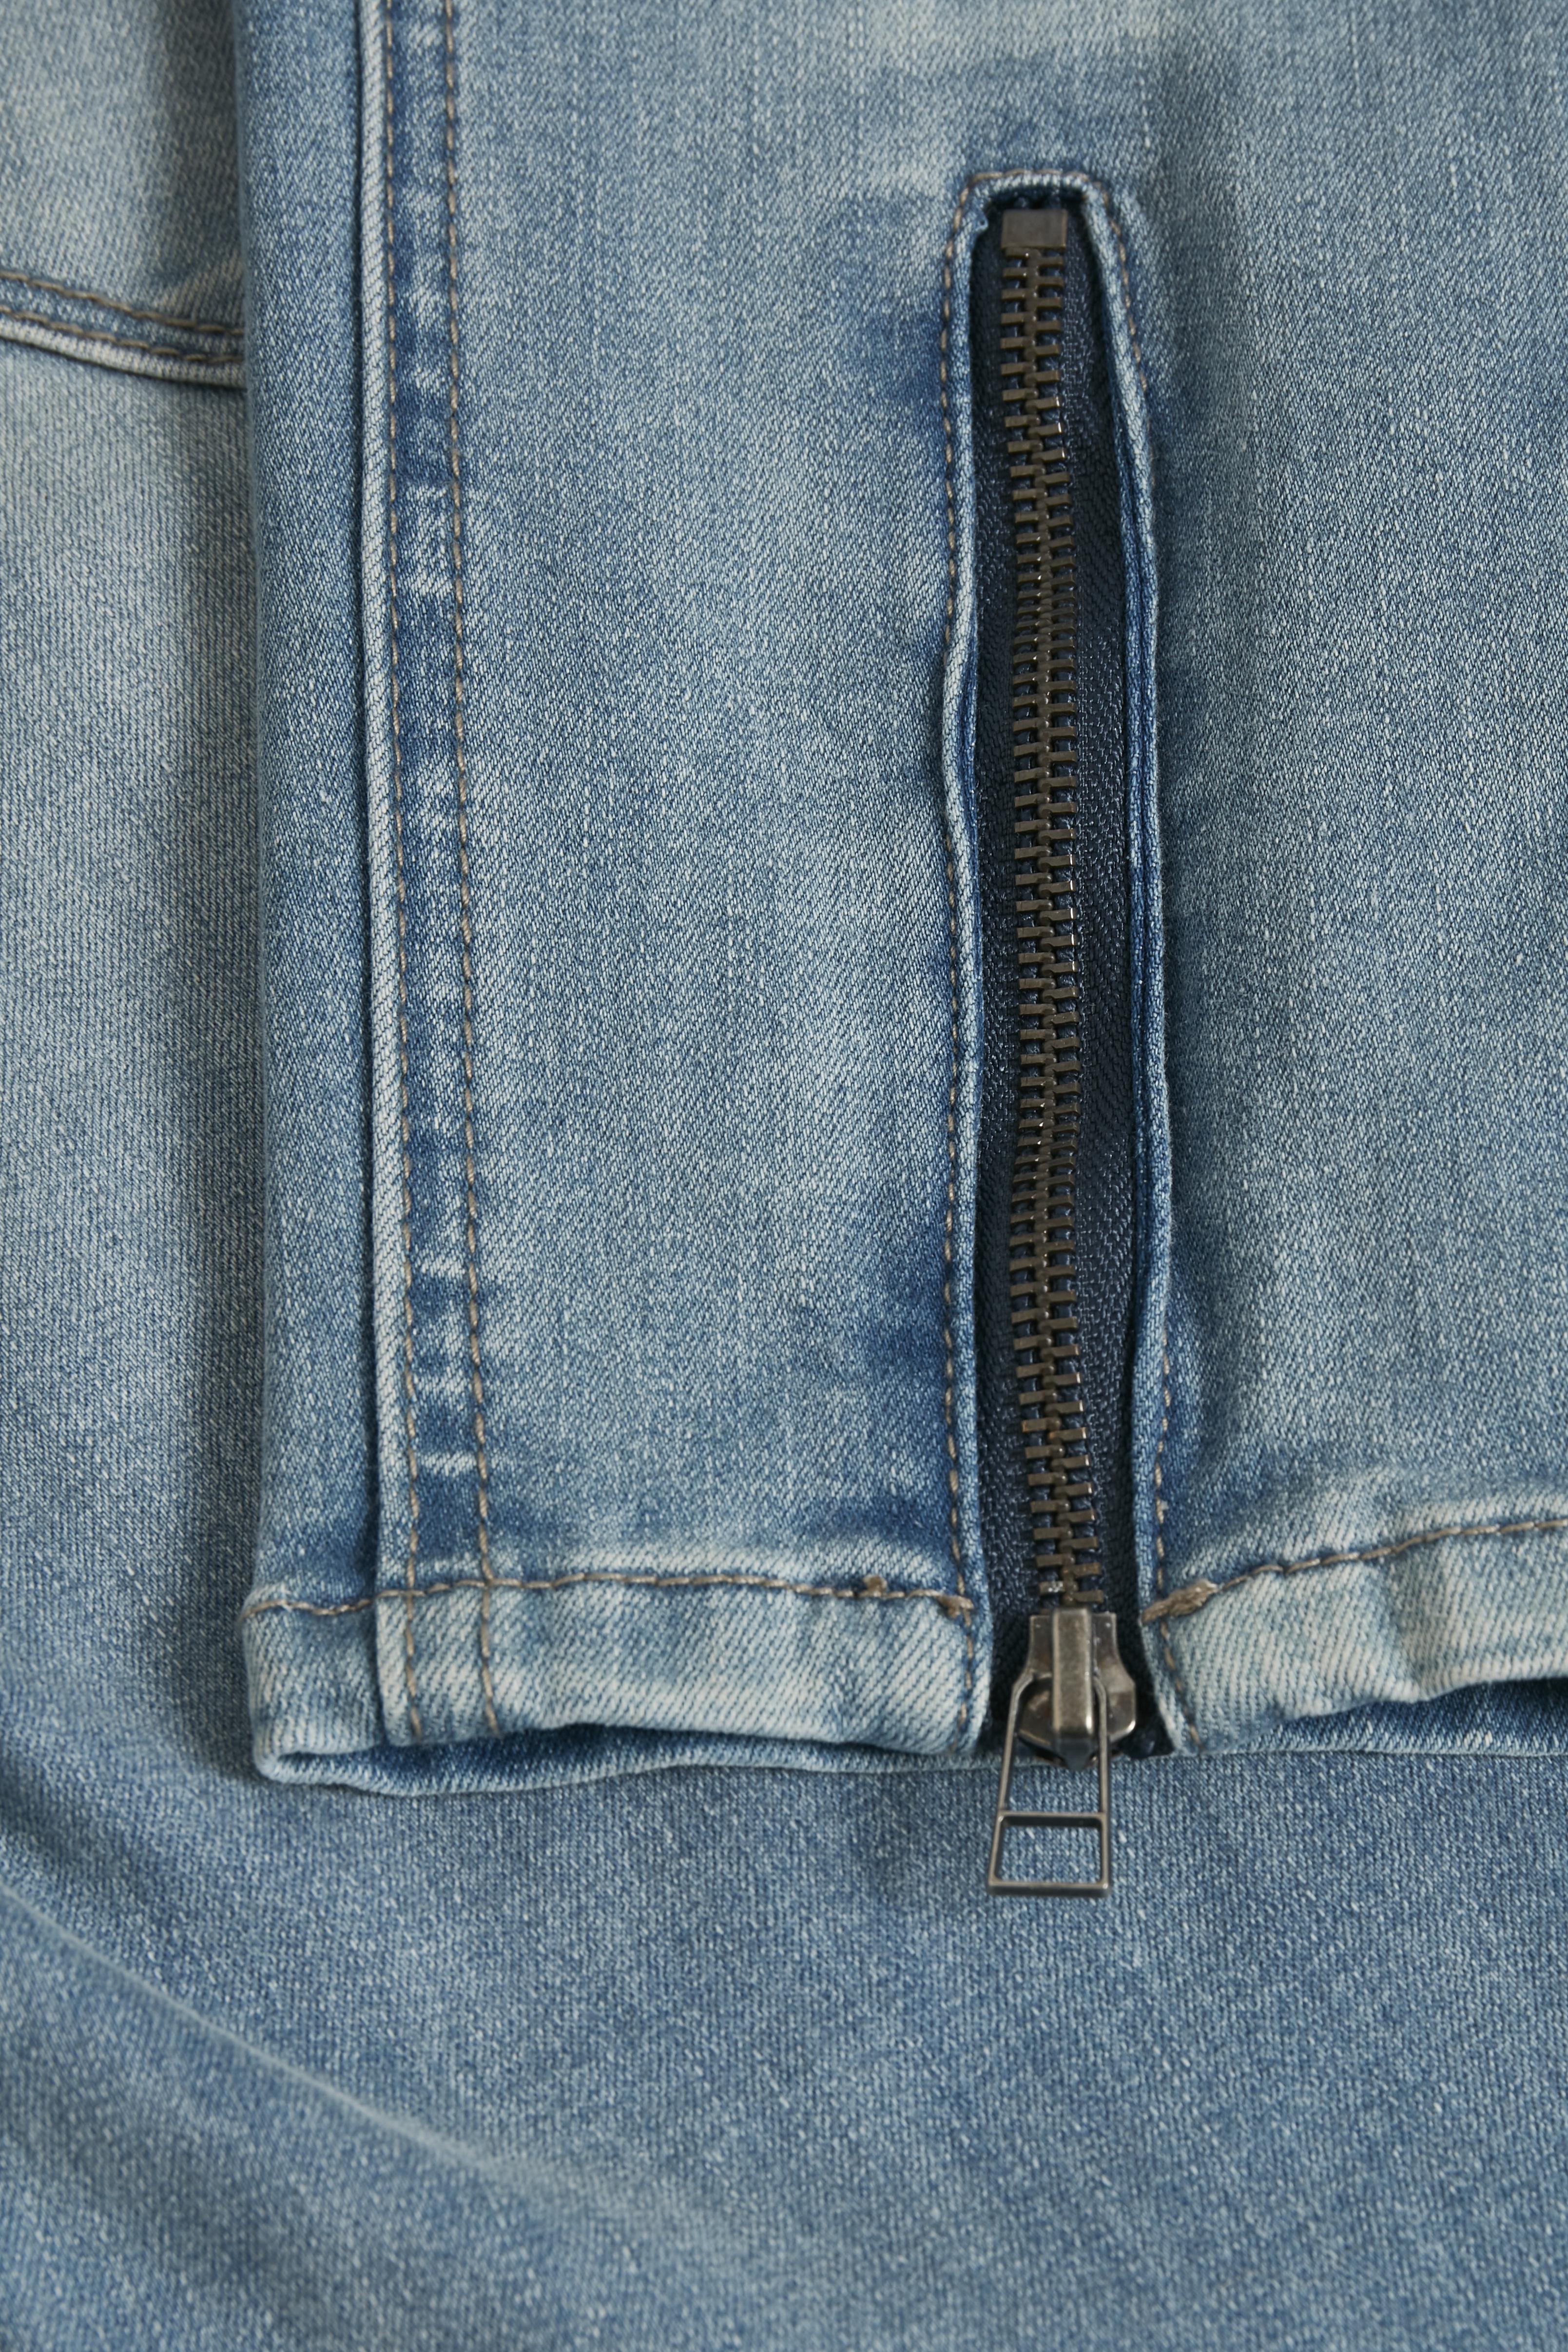 Hell denimblau Denim-Knöchelhose von Fransa – Shoppen Sie Hell denimblau Denim-Knöchelhose ab Gr. 34-46 hier